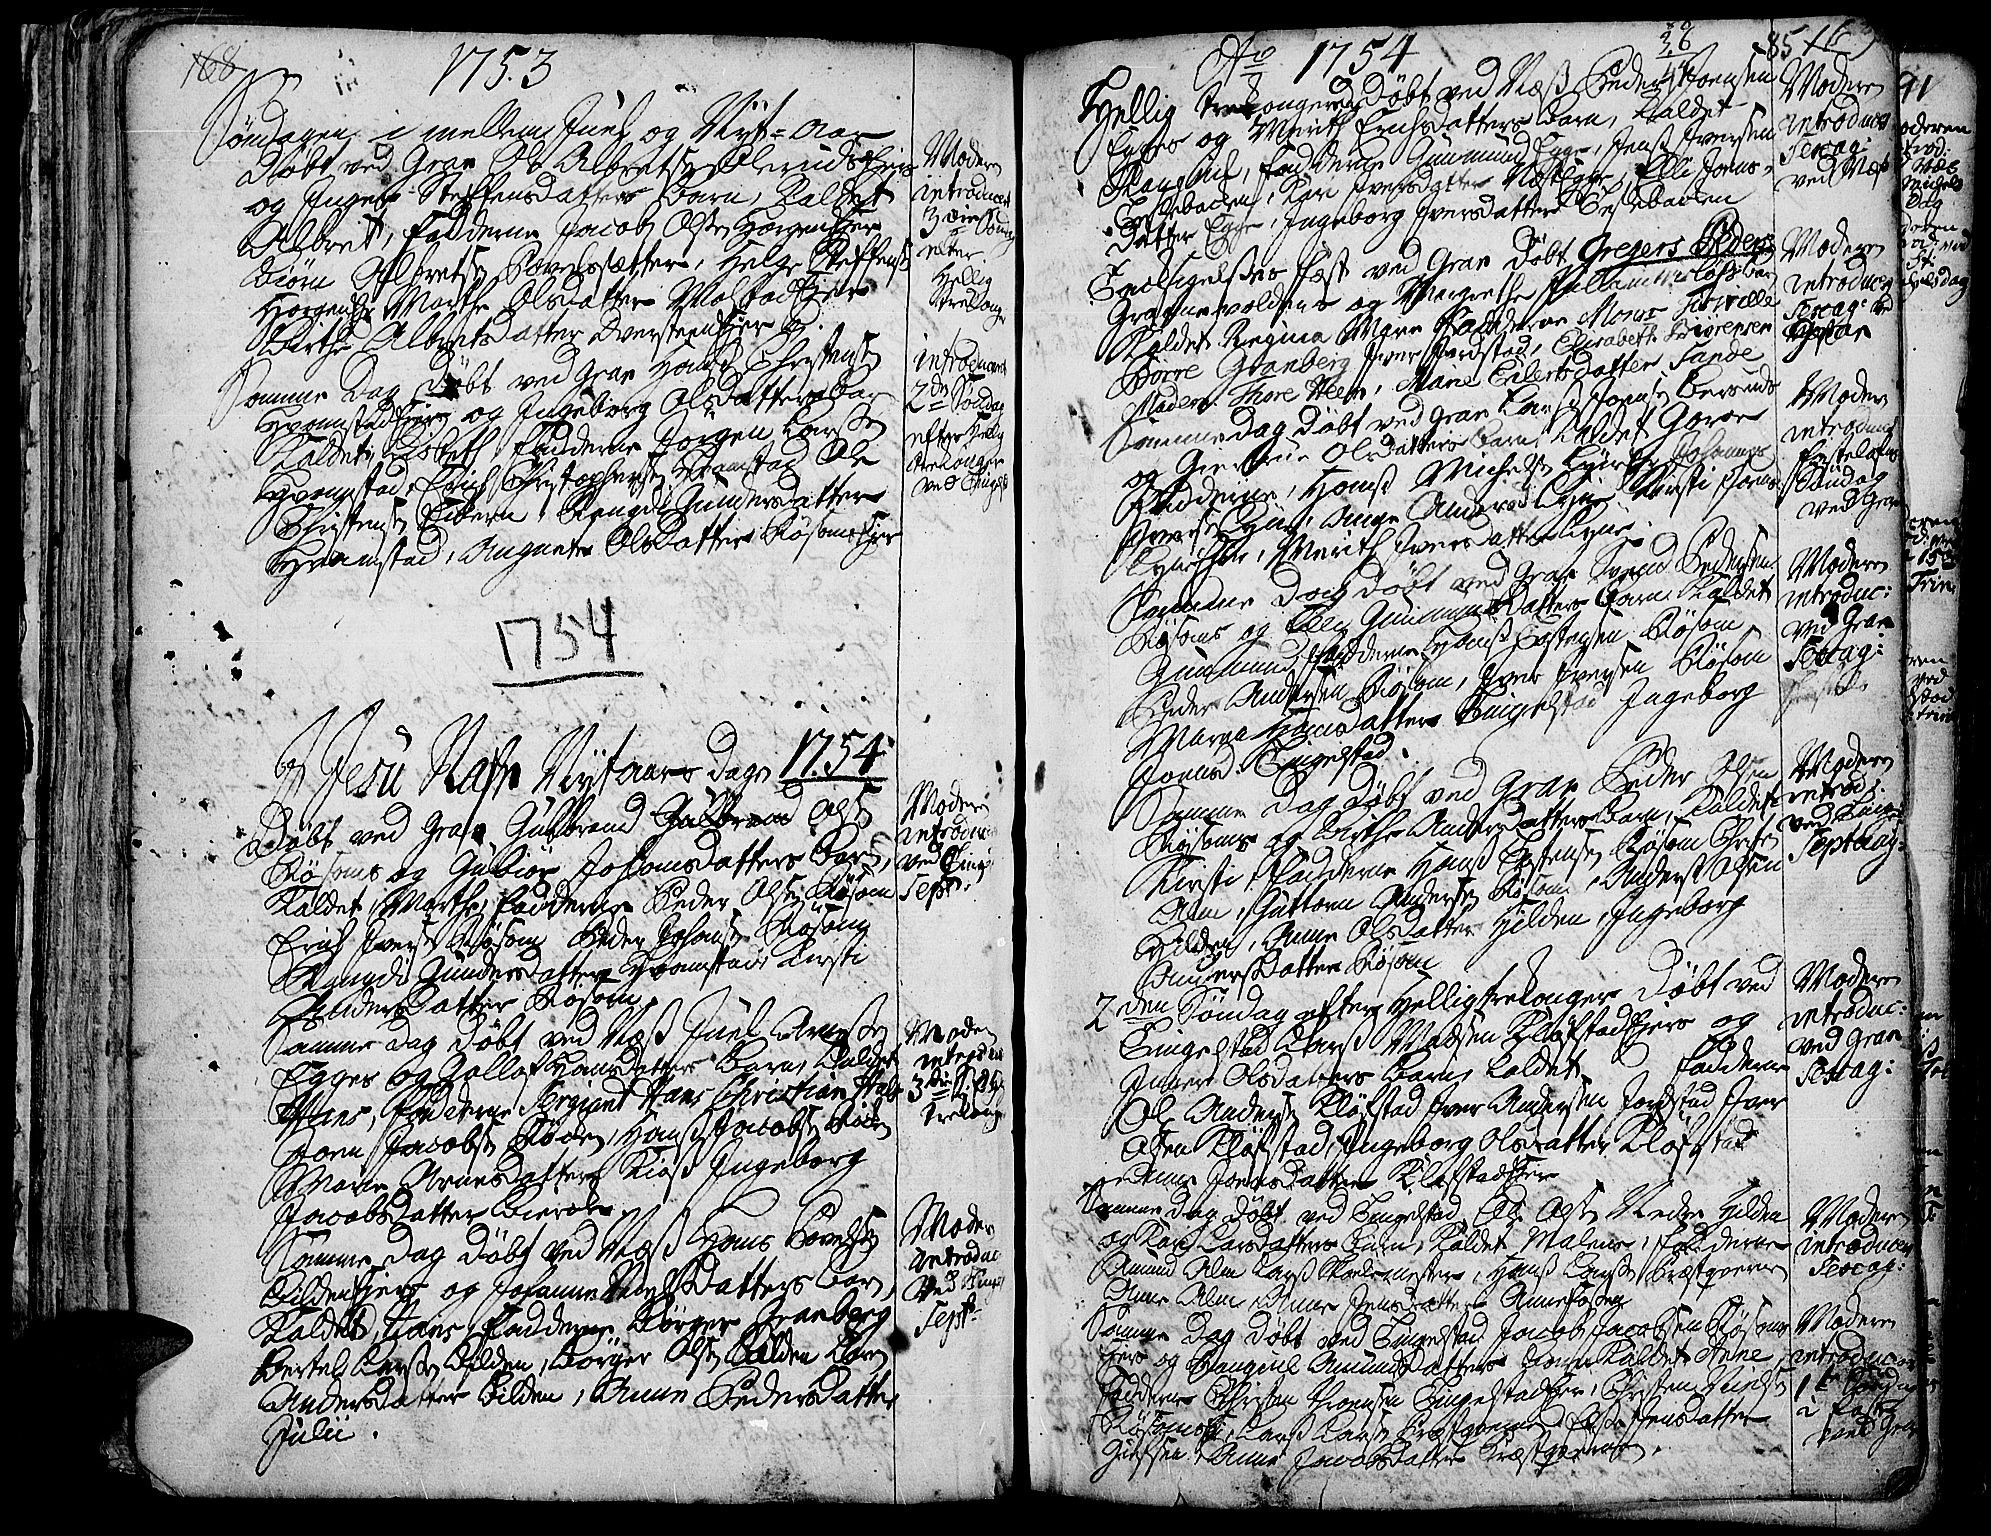 SAH, Gran prestekontor, Ministerialbok nr. 3, 1745-1758, s. 85